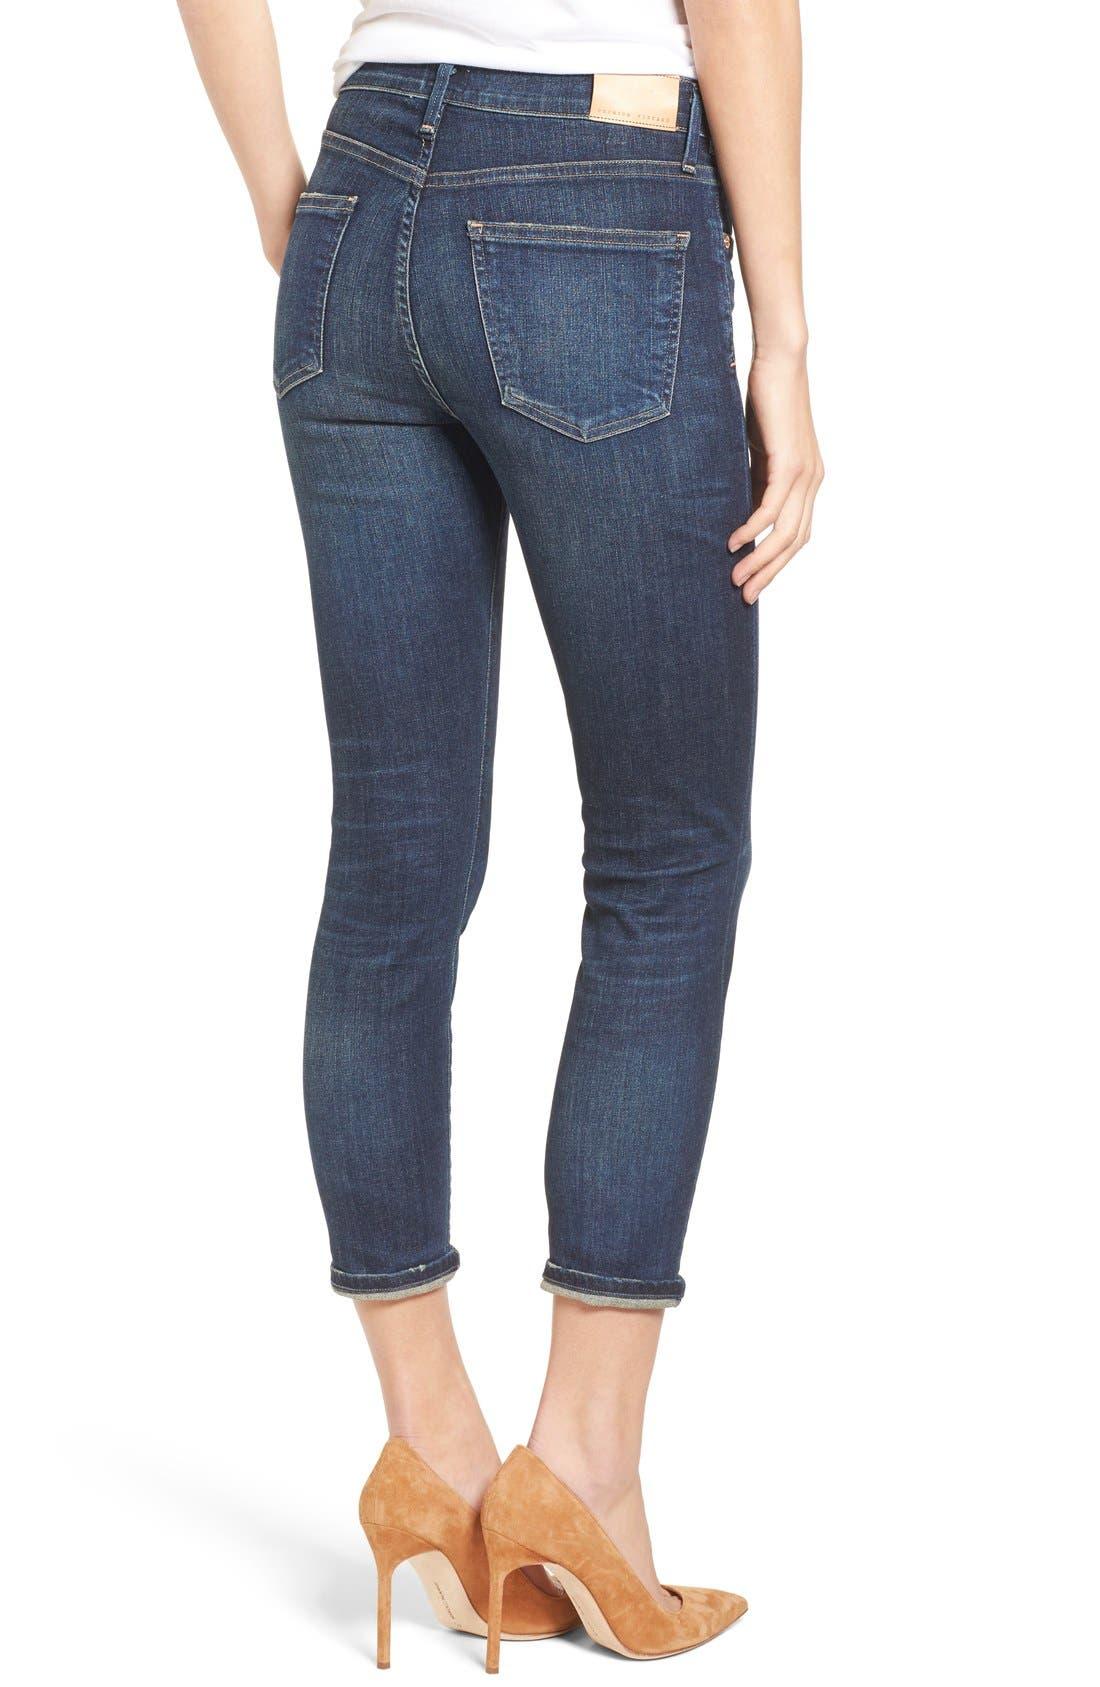 Rocket High Waist Crop Skinny Jeans,                             Alternate thumbnail 3, color,                             410